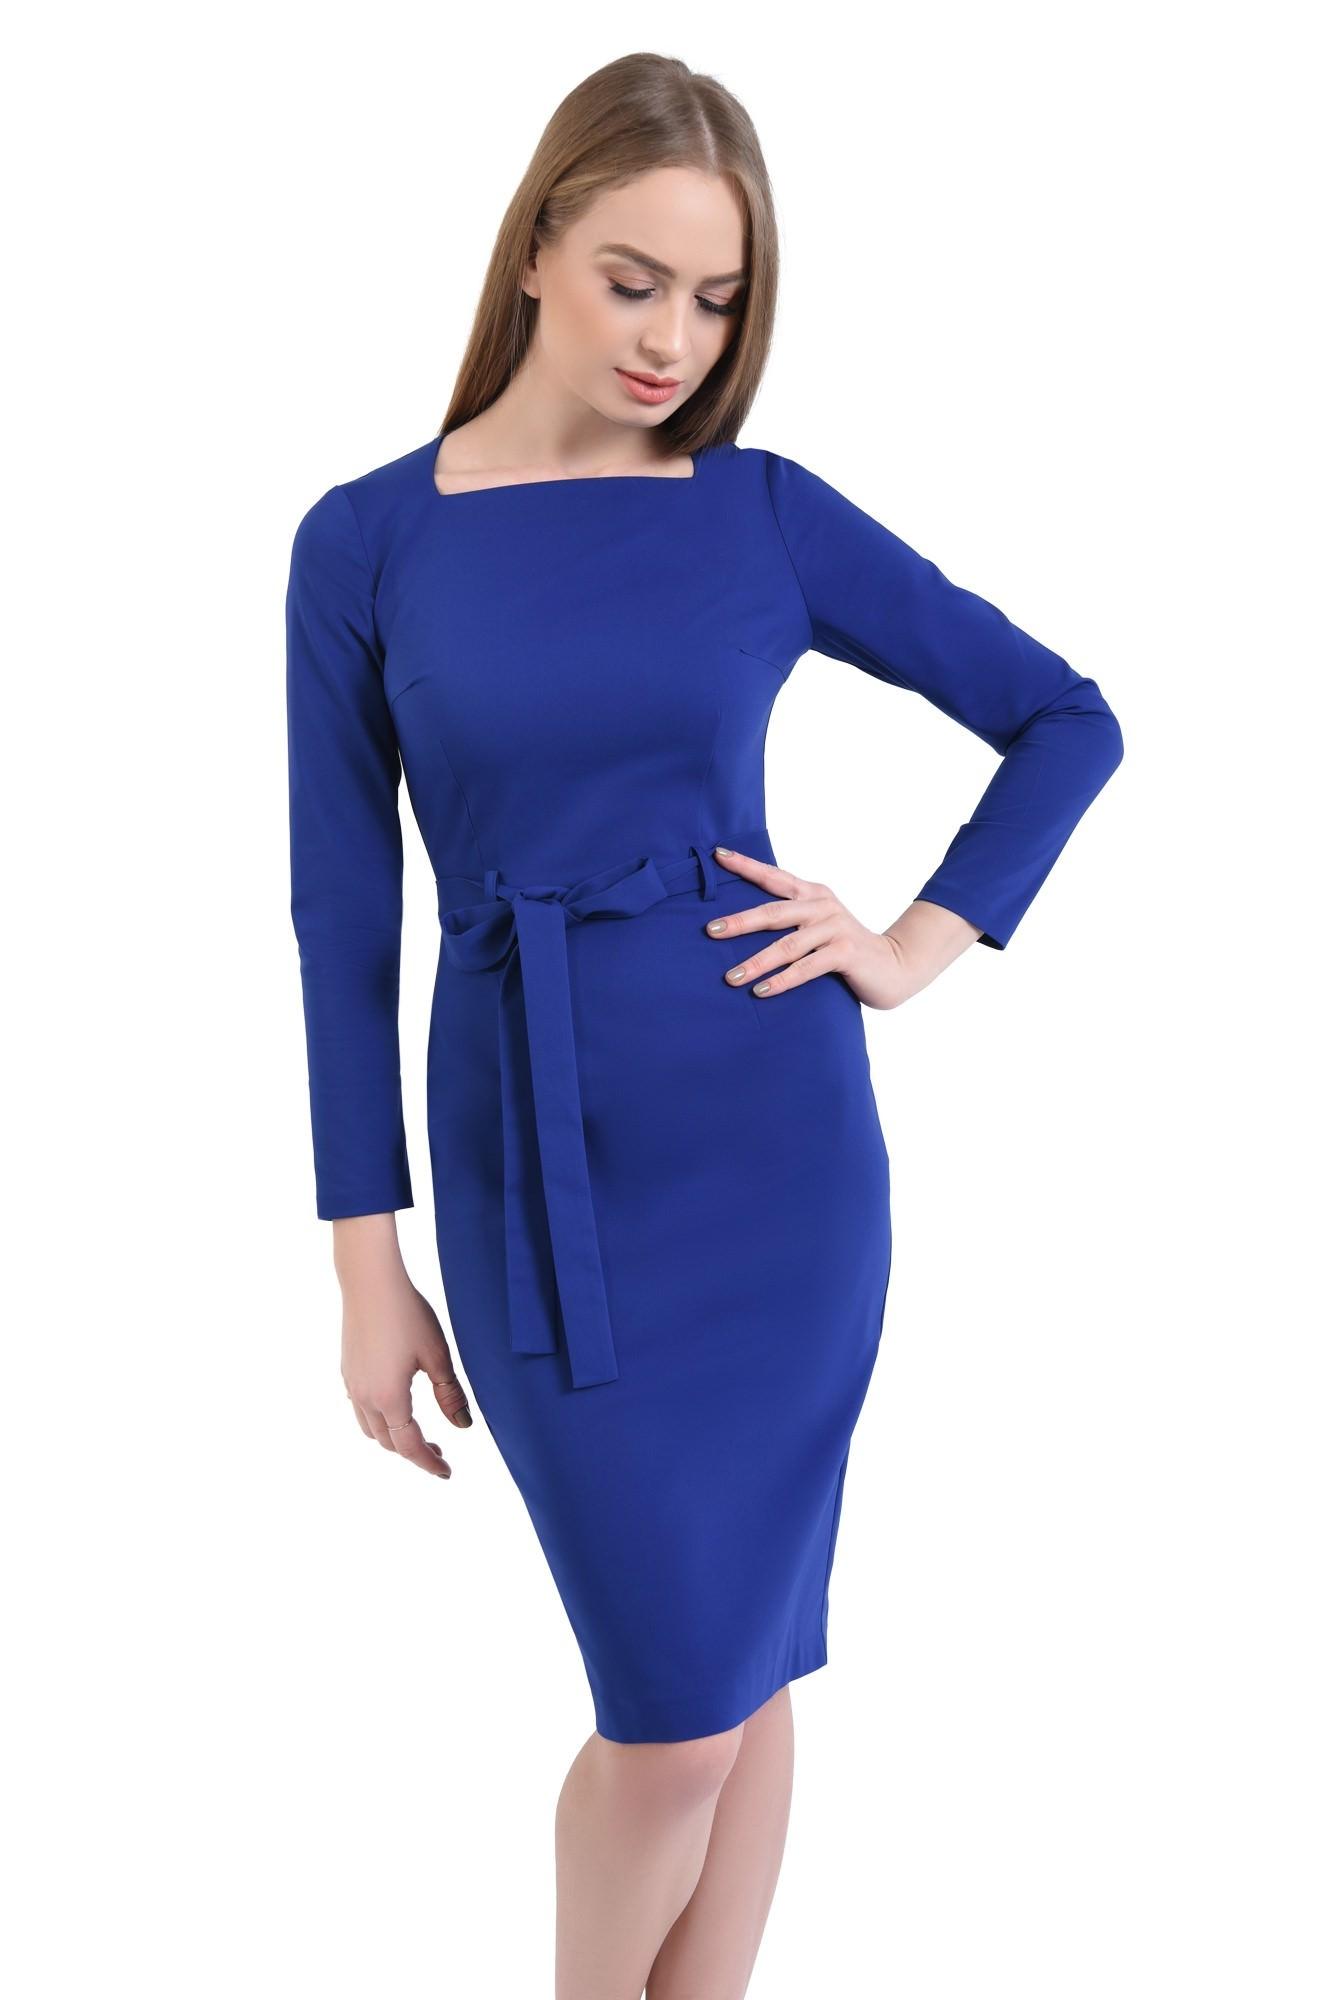 rochie de zi, conica, albastru, cordon